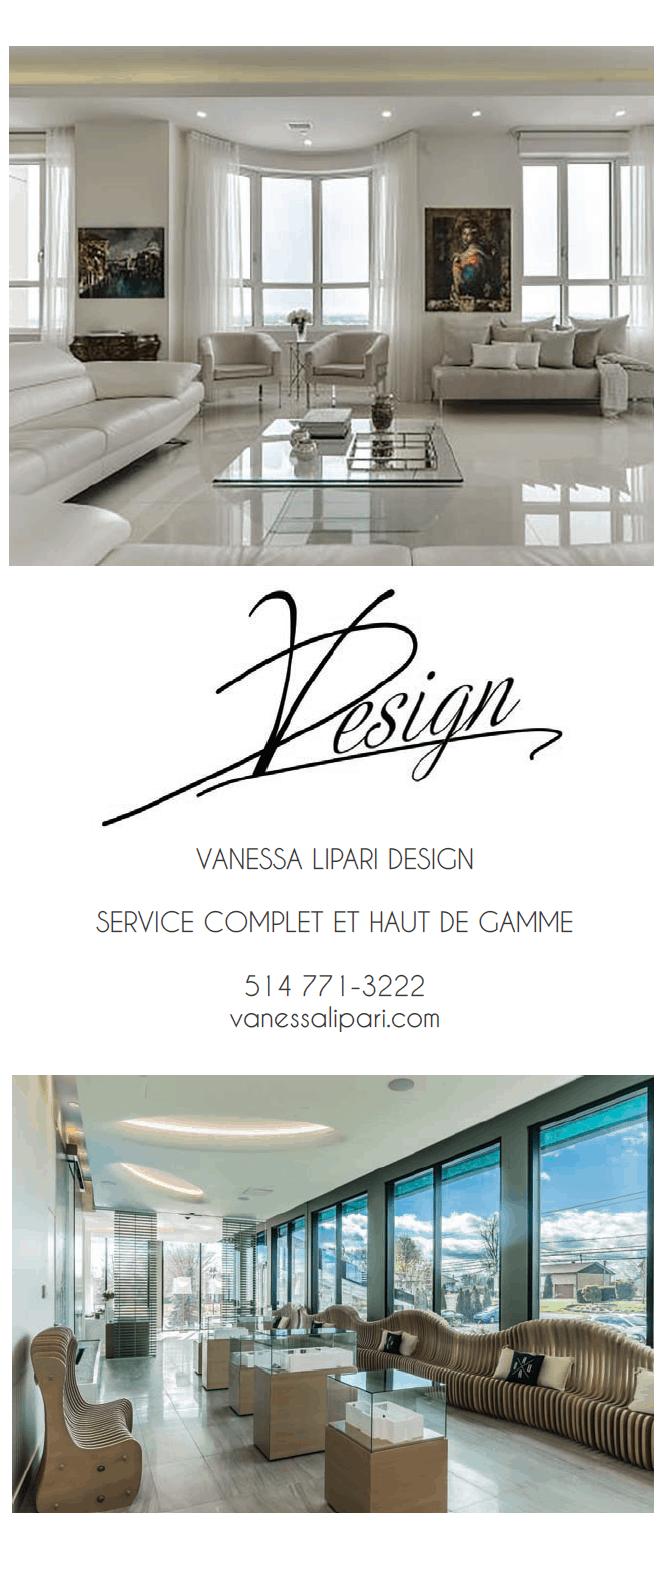 Vanessa Lipari Designs